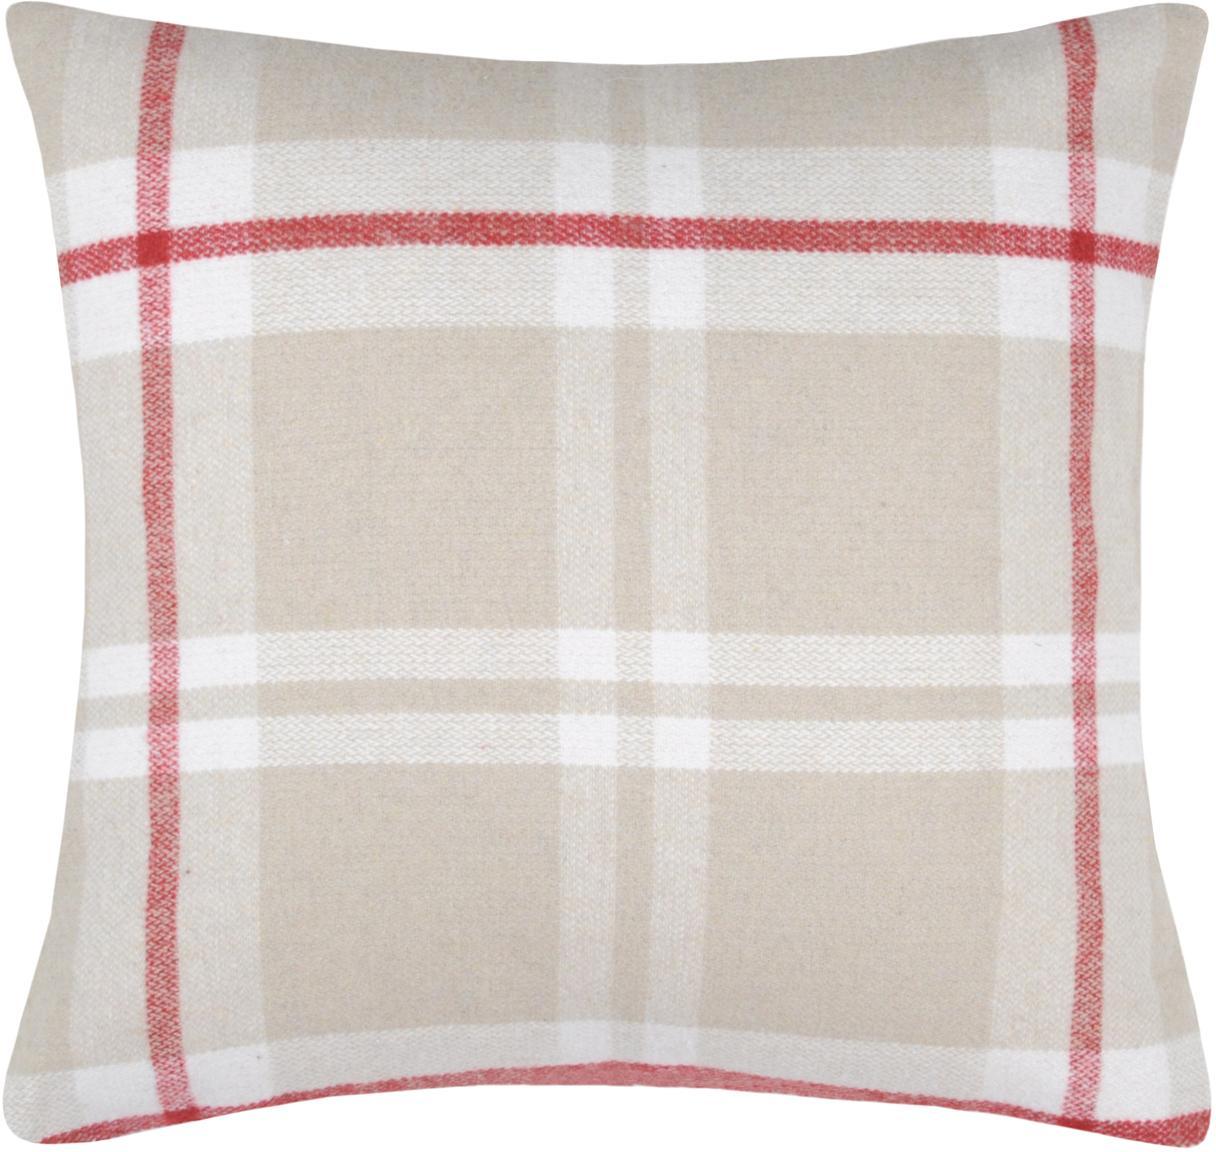 Federa arredo a quadri Granier, 95% poliestere, 5% lana, Beige, bianco, rosso, Larg. 40 x Lung. 40 cm